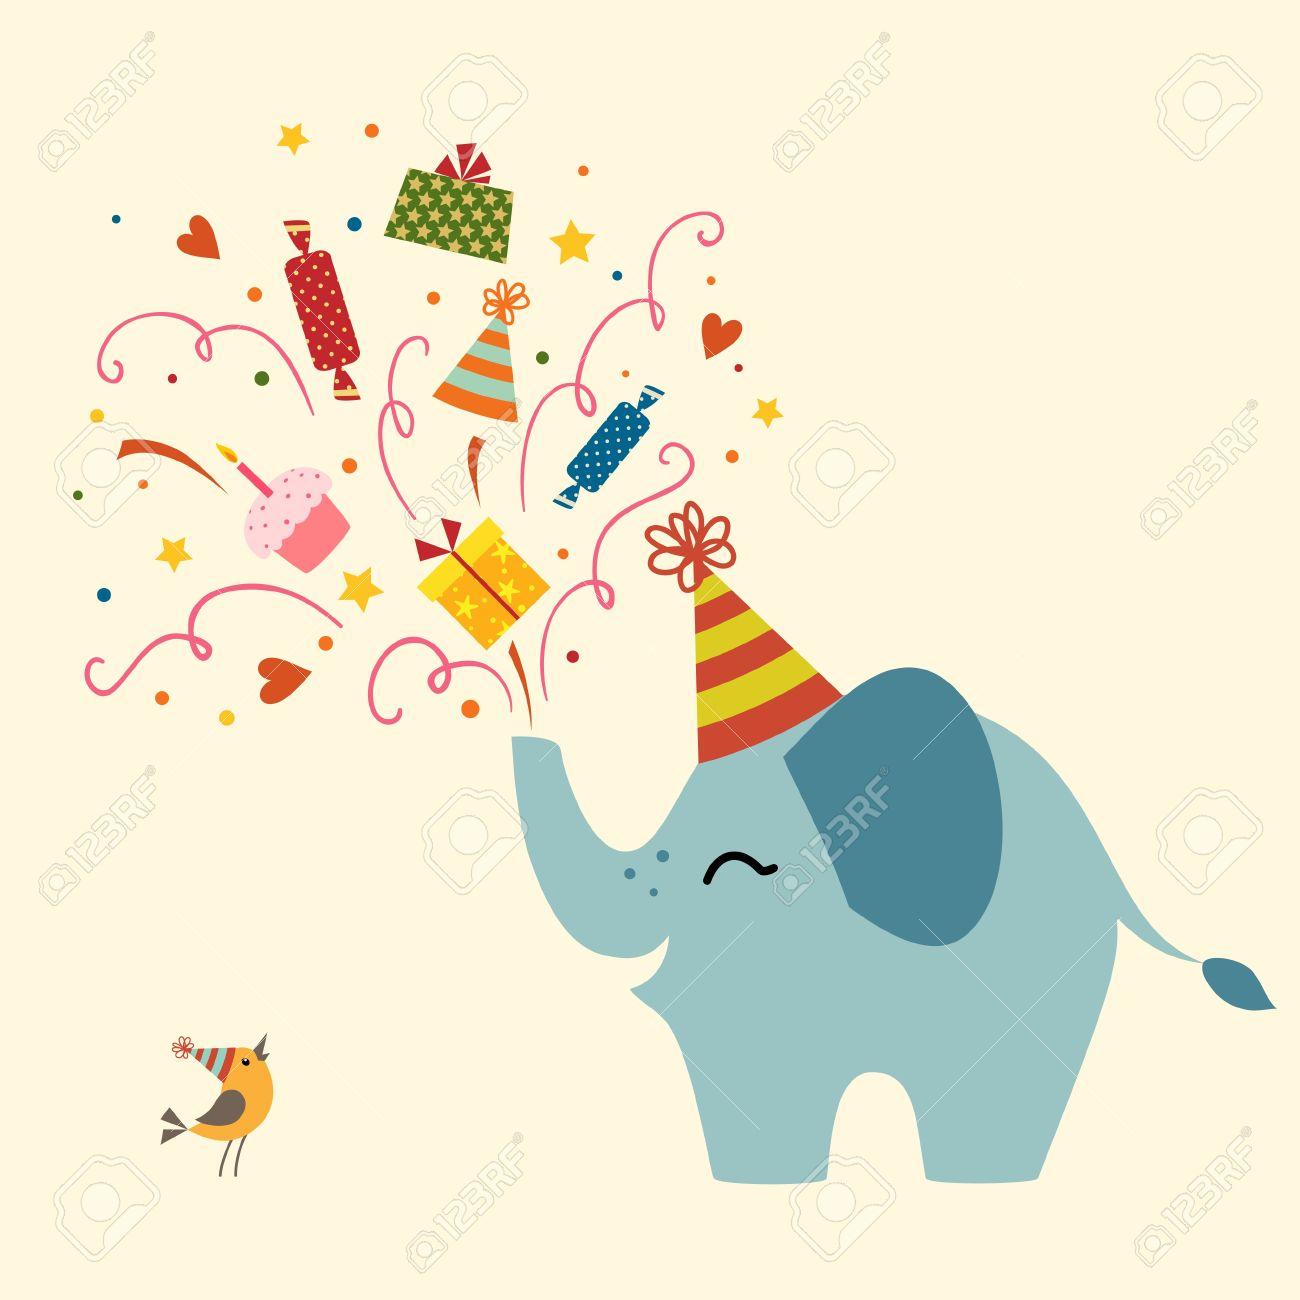 Birthday greetings from cute elephant. - 19403588